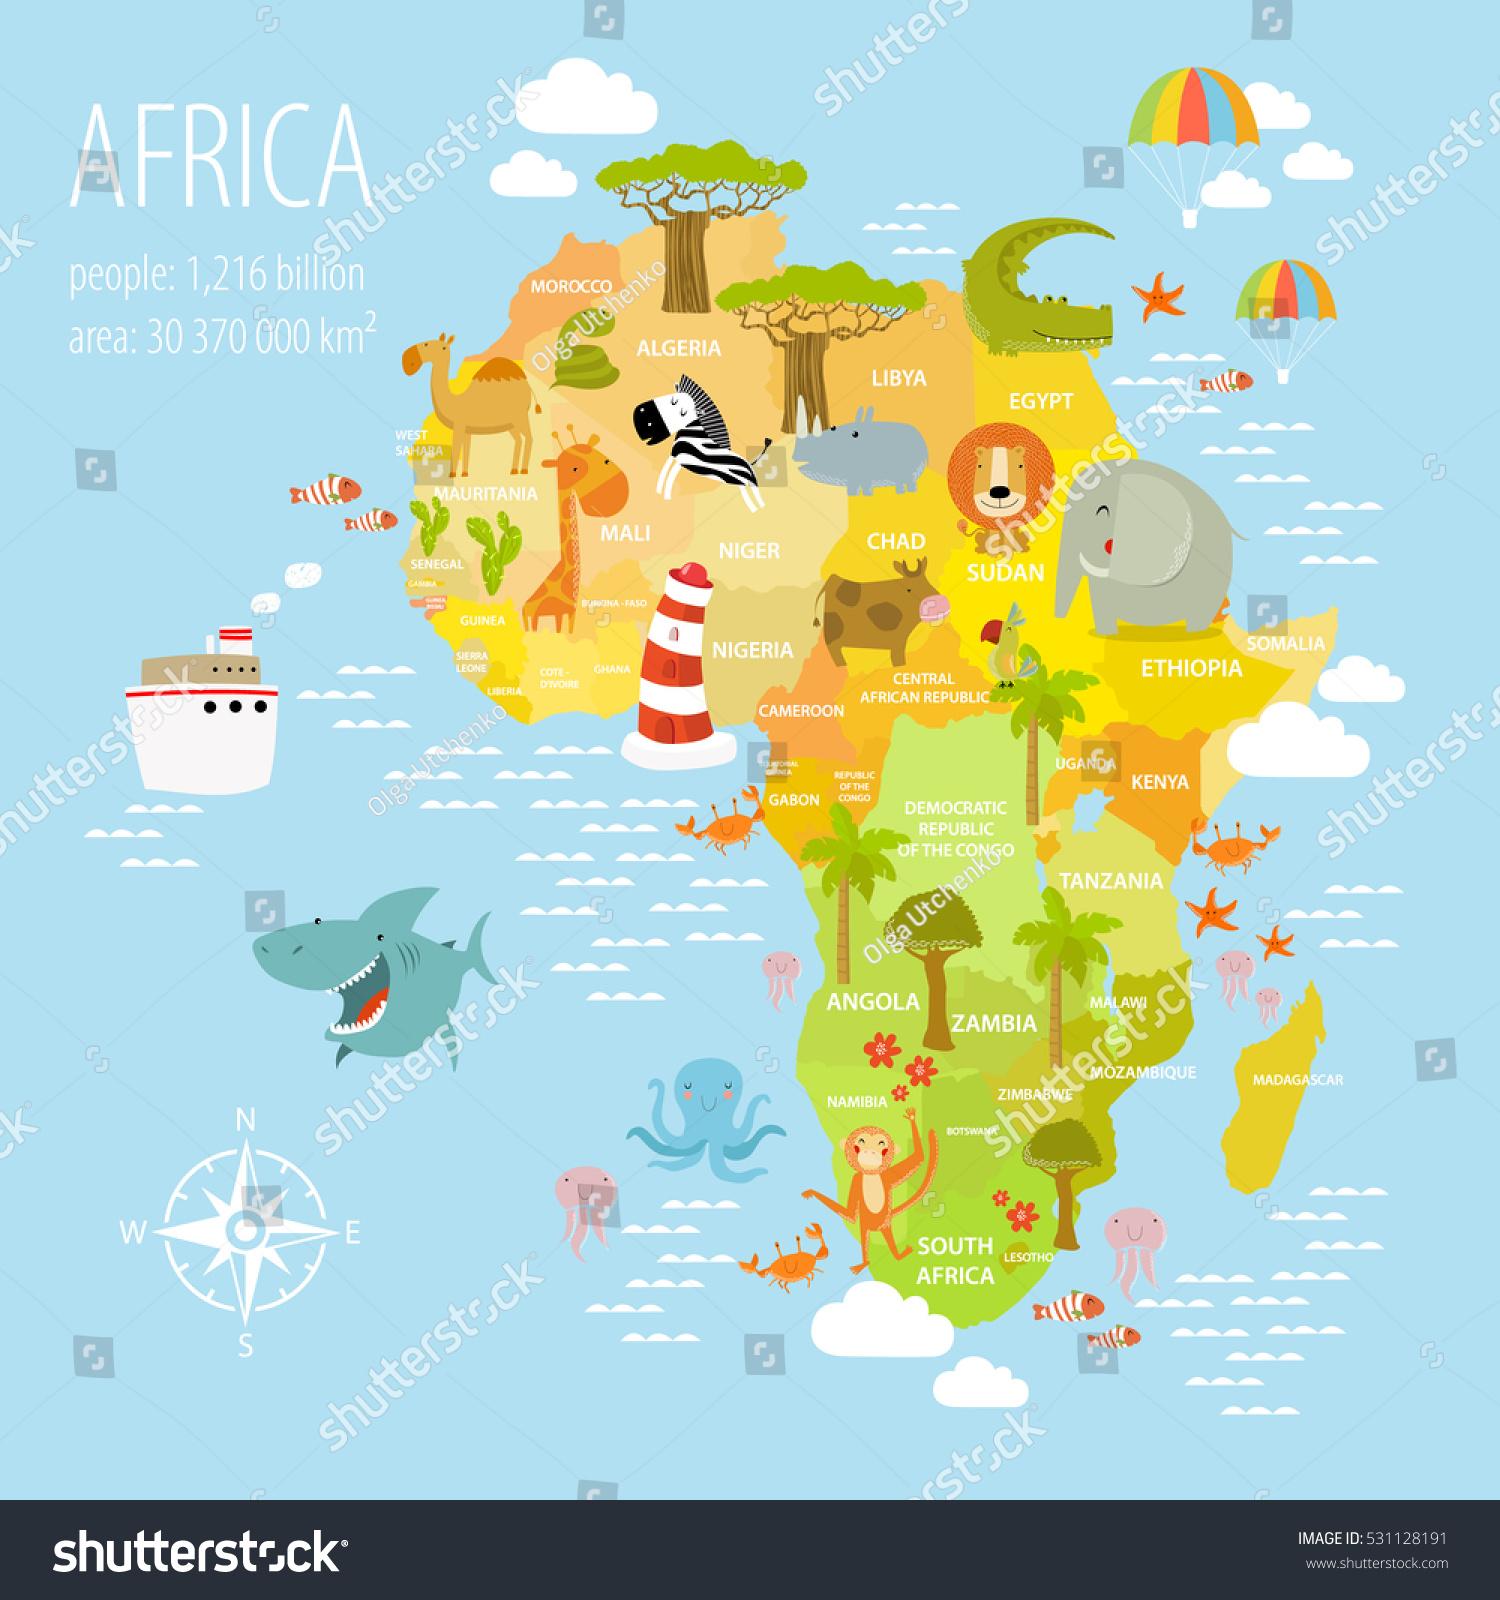 vector illustration map africa on lion のベクター画像素材